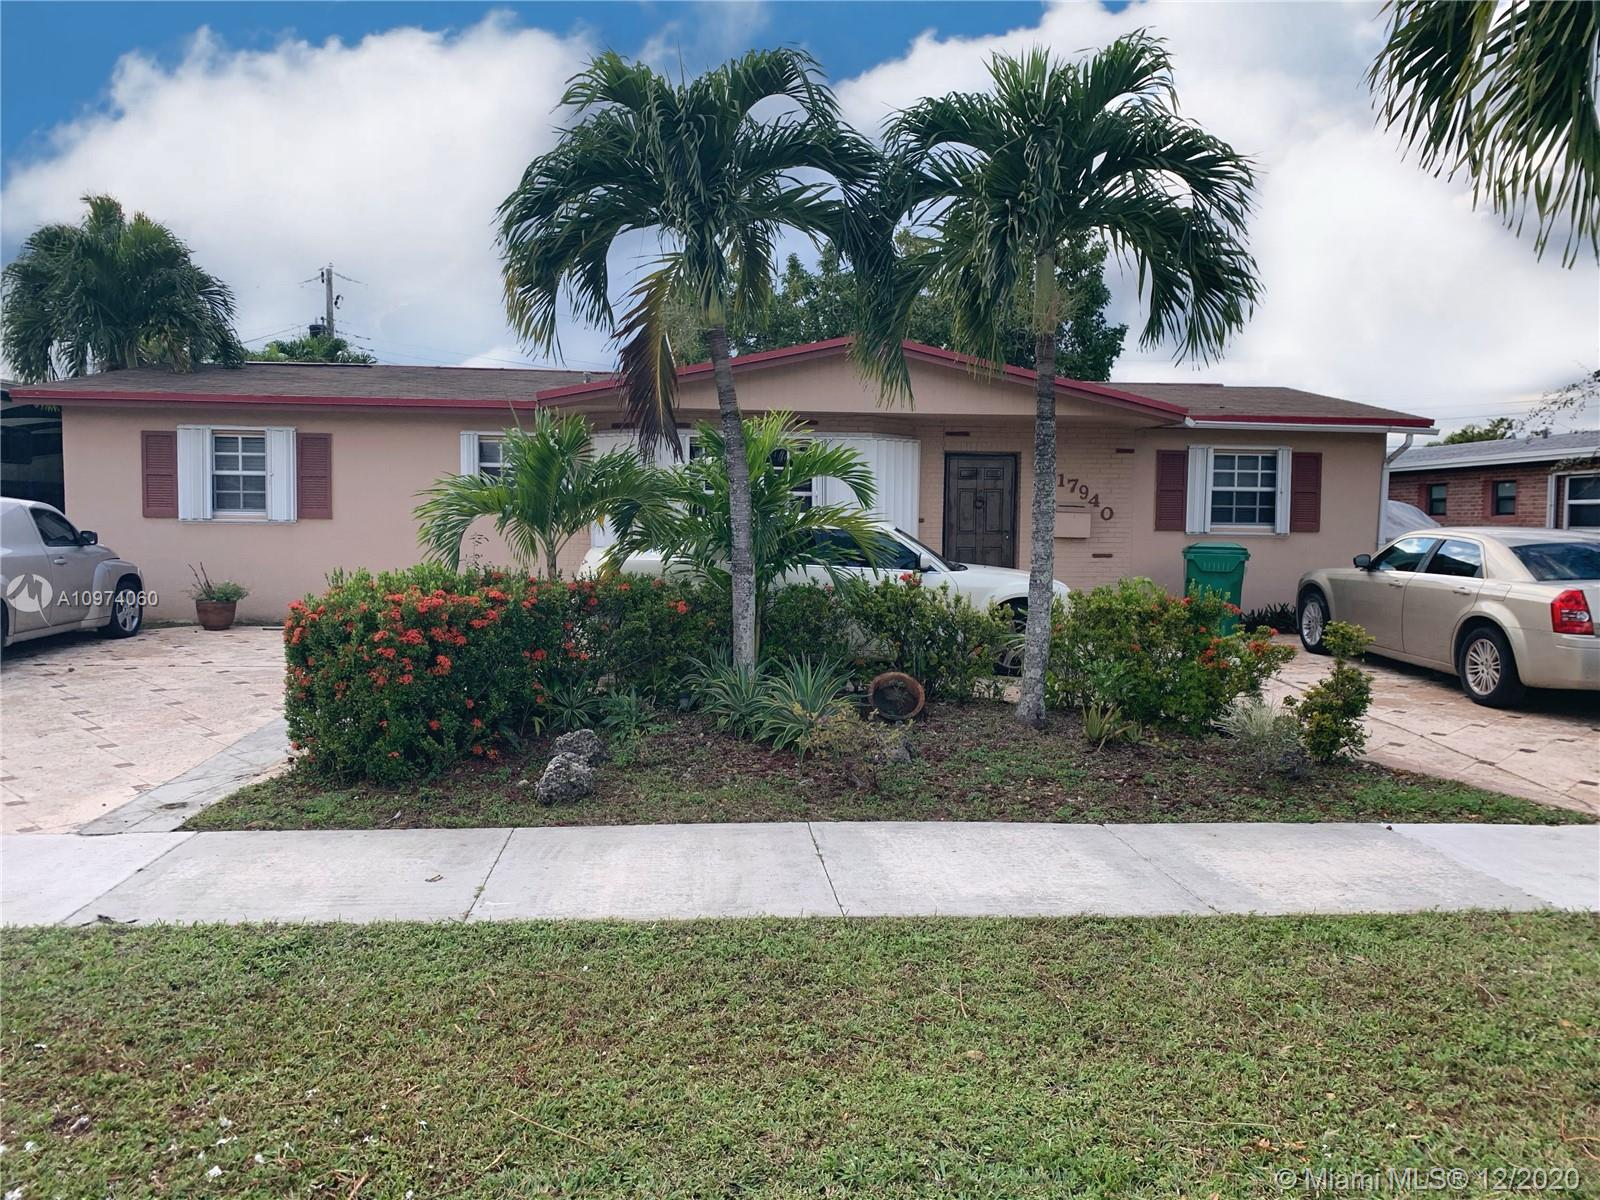 Palm Springs North - 17940 NW 77th Ct, Hialeah, FL 33015